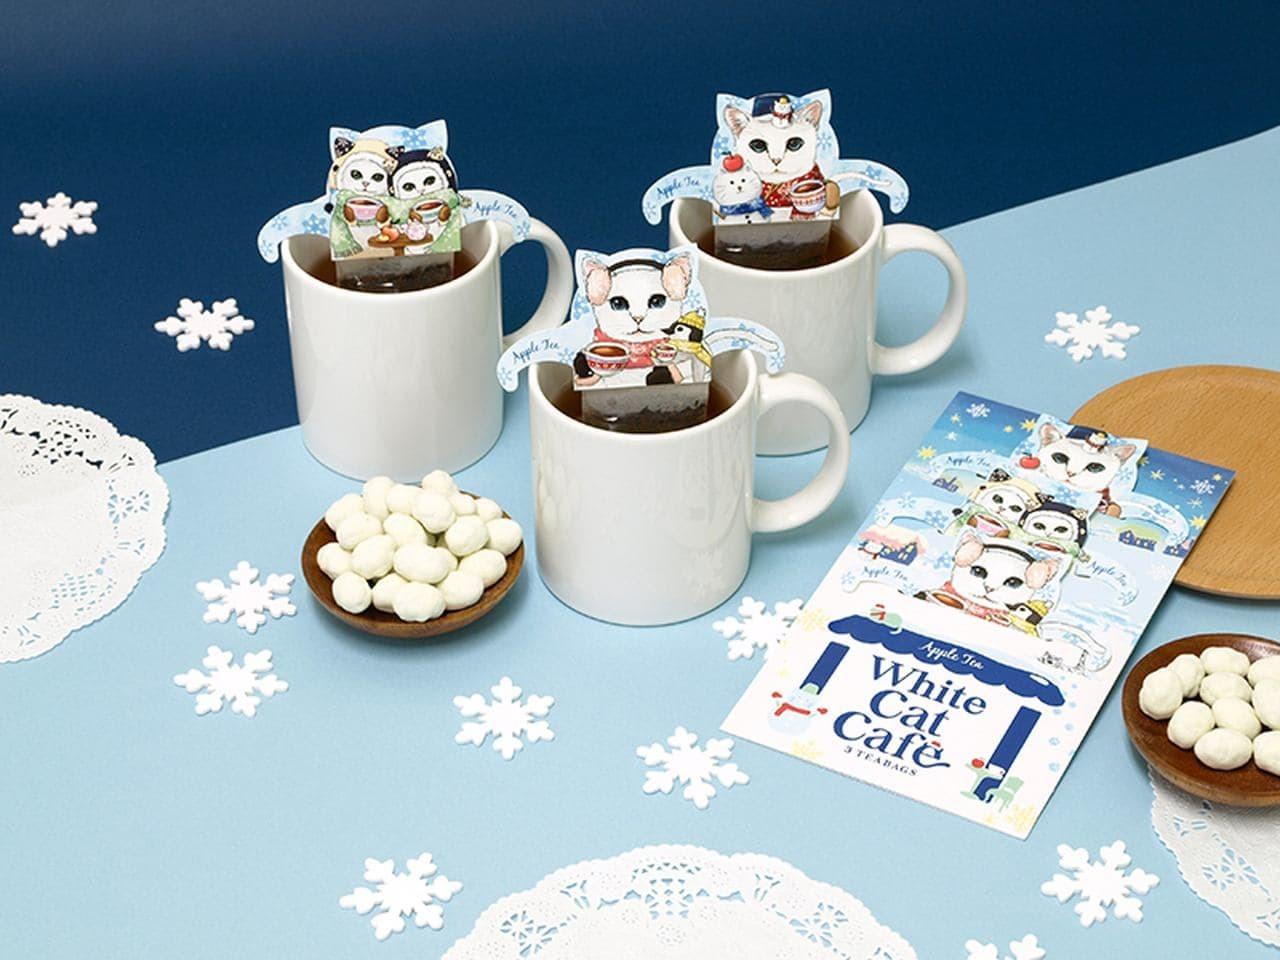 WhiteCat Cafe_cat-tea02